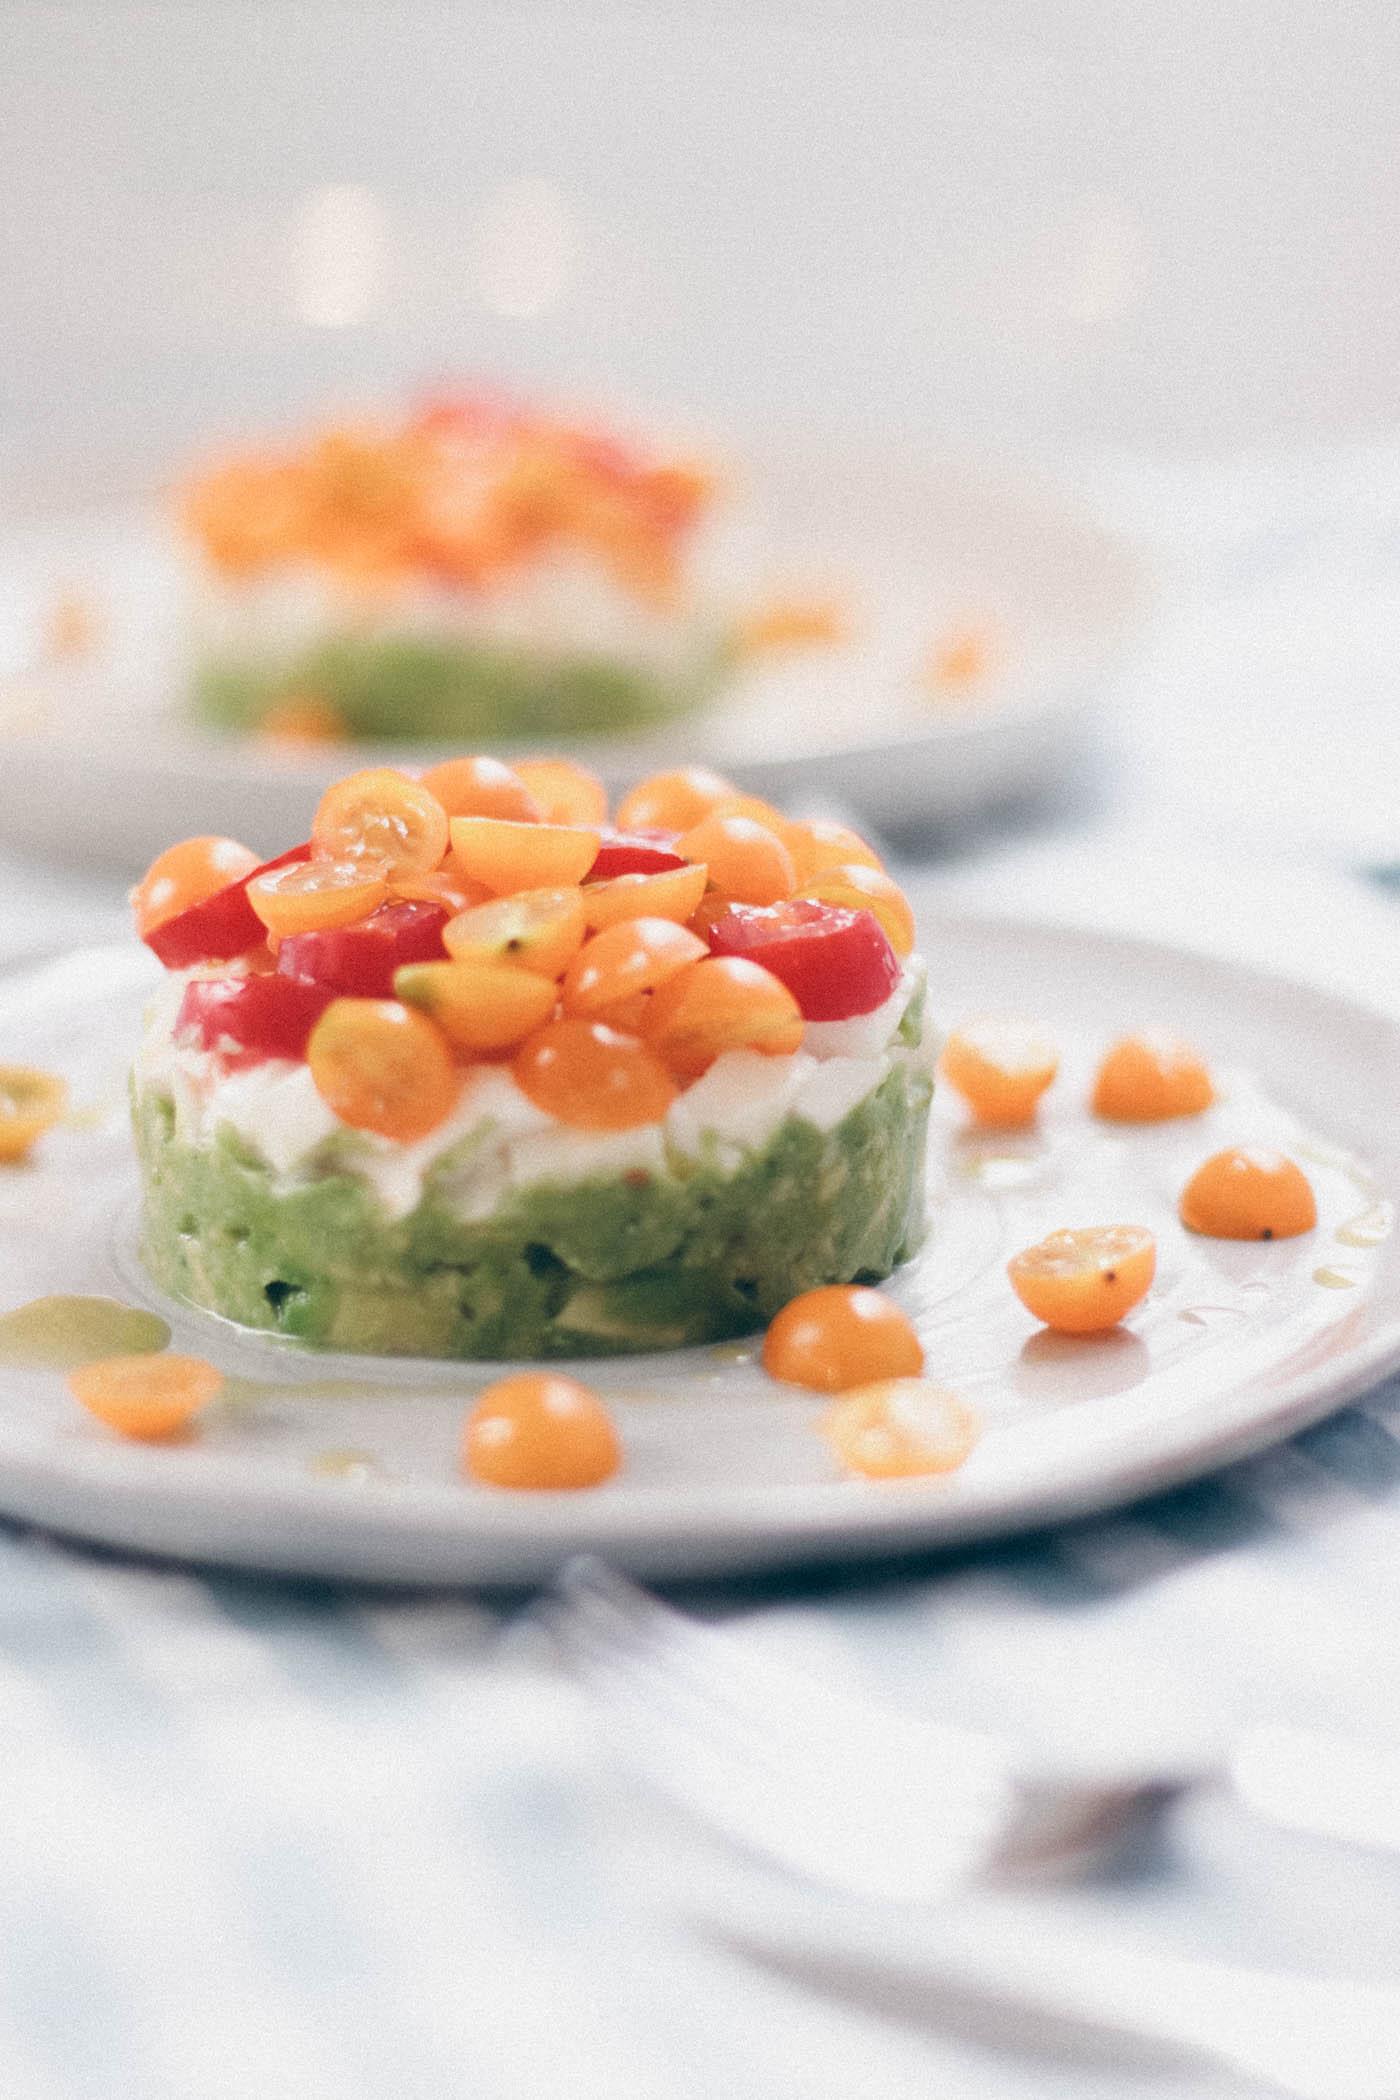 Mozzarella Tomato Avocado Tartare